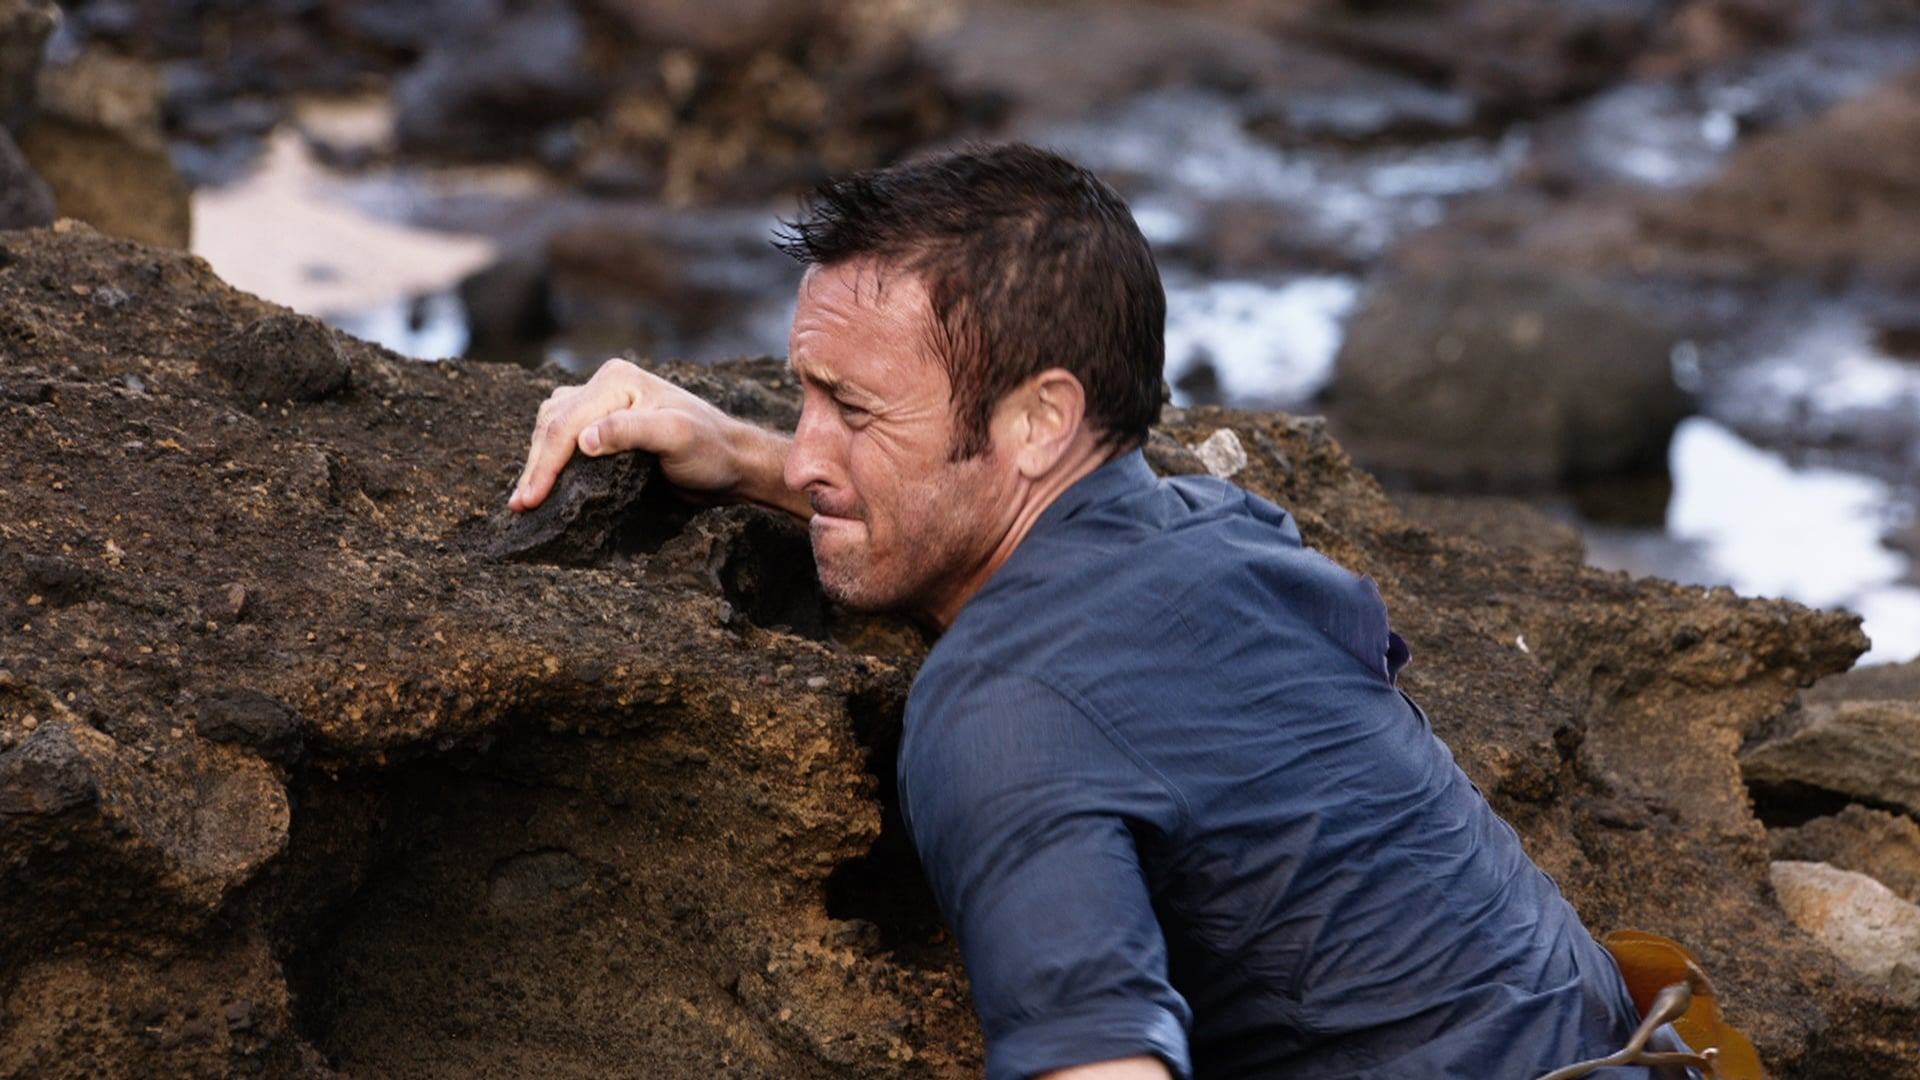 Hawaii Five-0 - Season 7 Episode 4 : Hu a'e ke ahi lanakila a Kamaile (The Fire of Kamile Rises in Triumph)